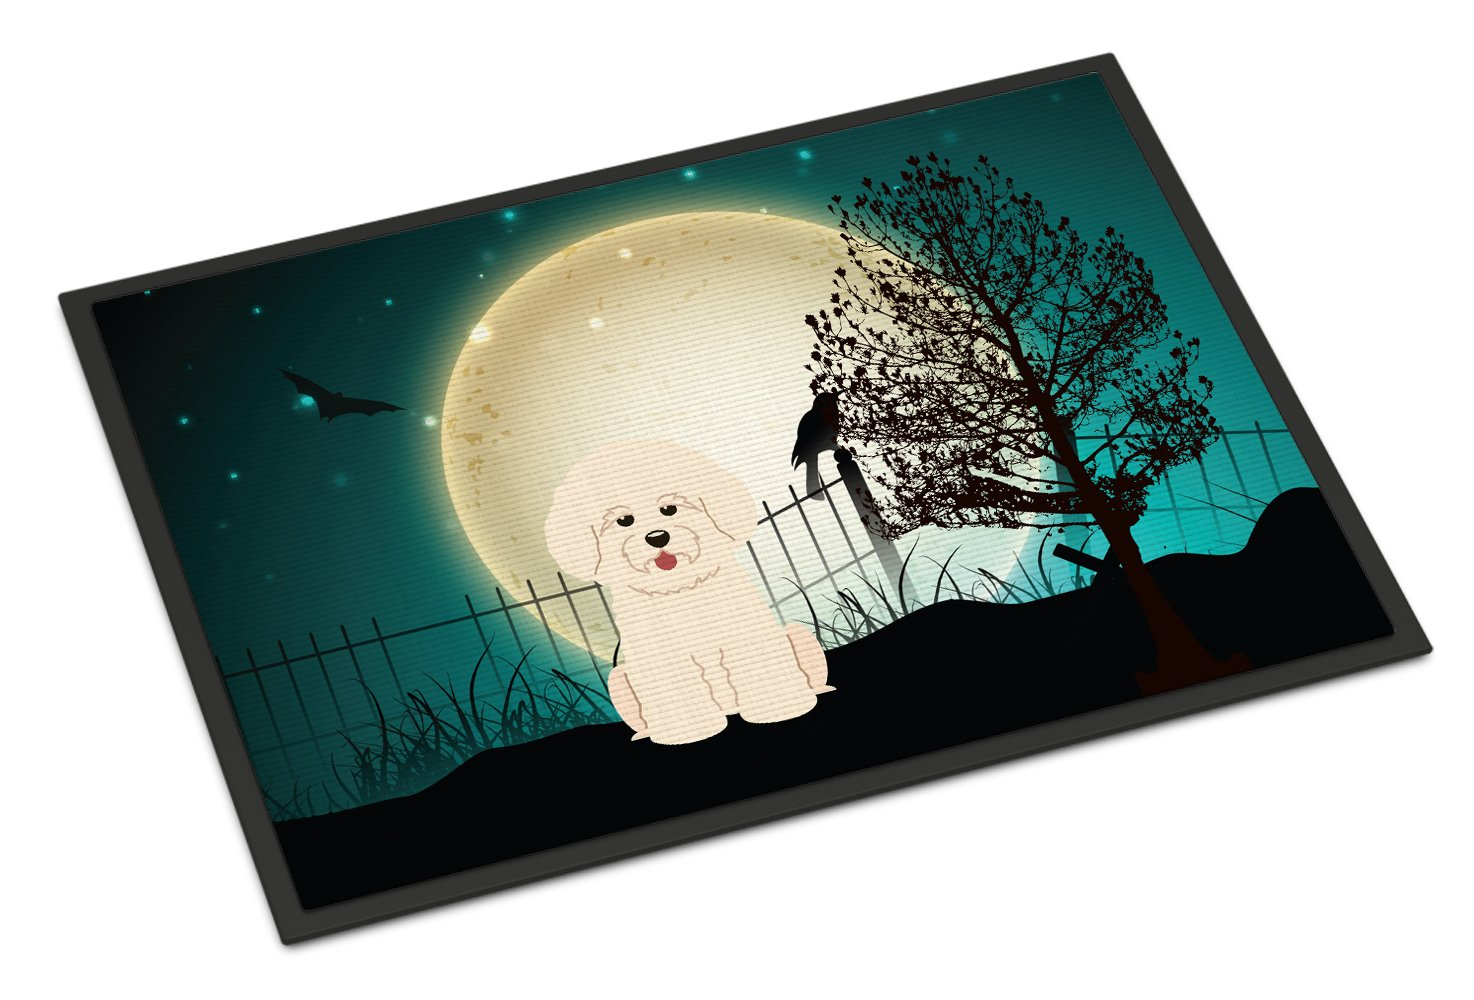 Carolines Treasures Halloween Scary Bichon Frise Indoor or Outdoor Mat 24x36 BB2265JMAT 24 x 36 Multicolor